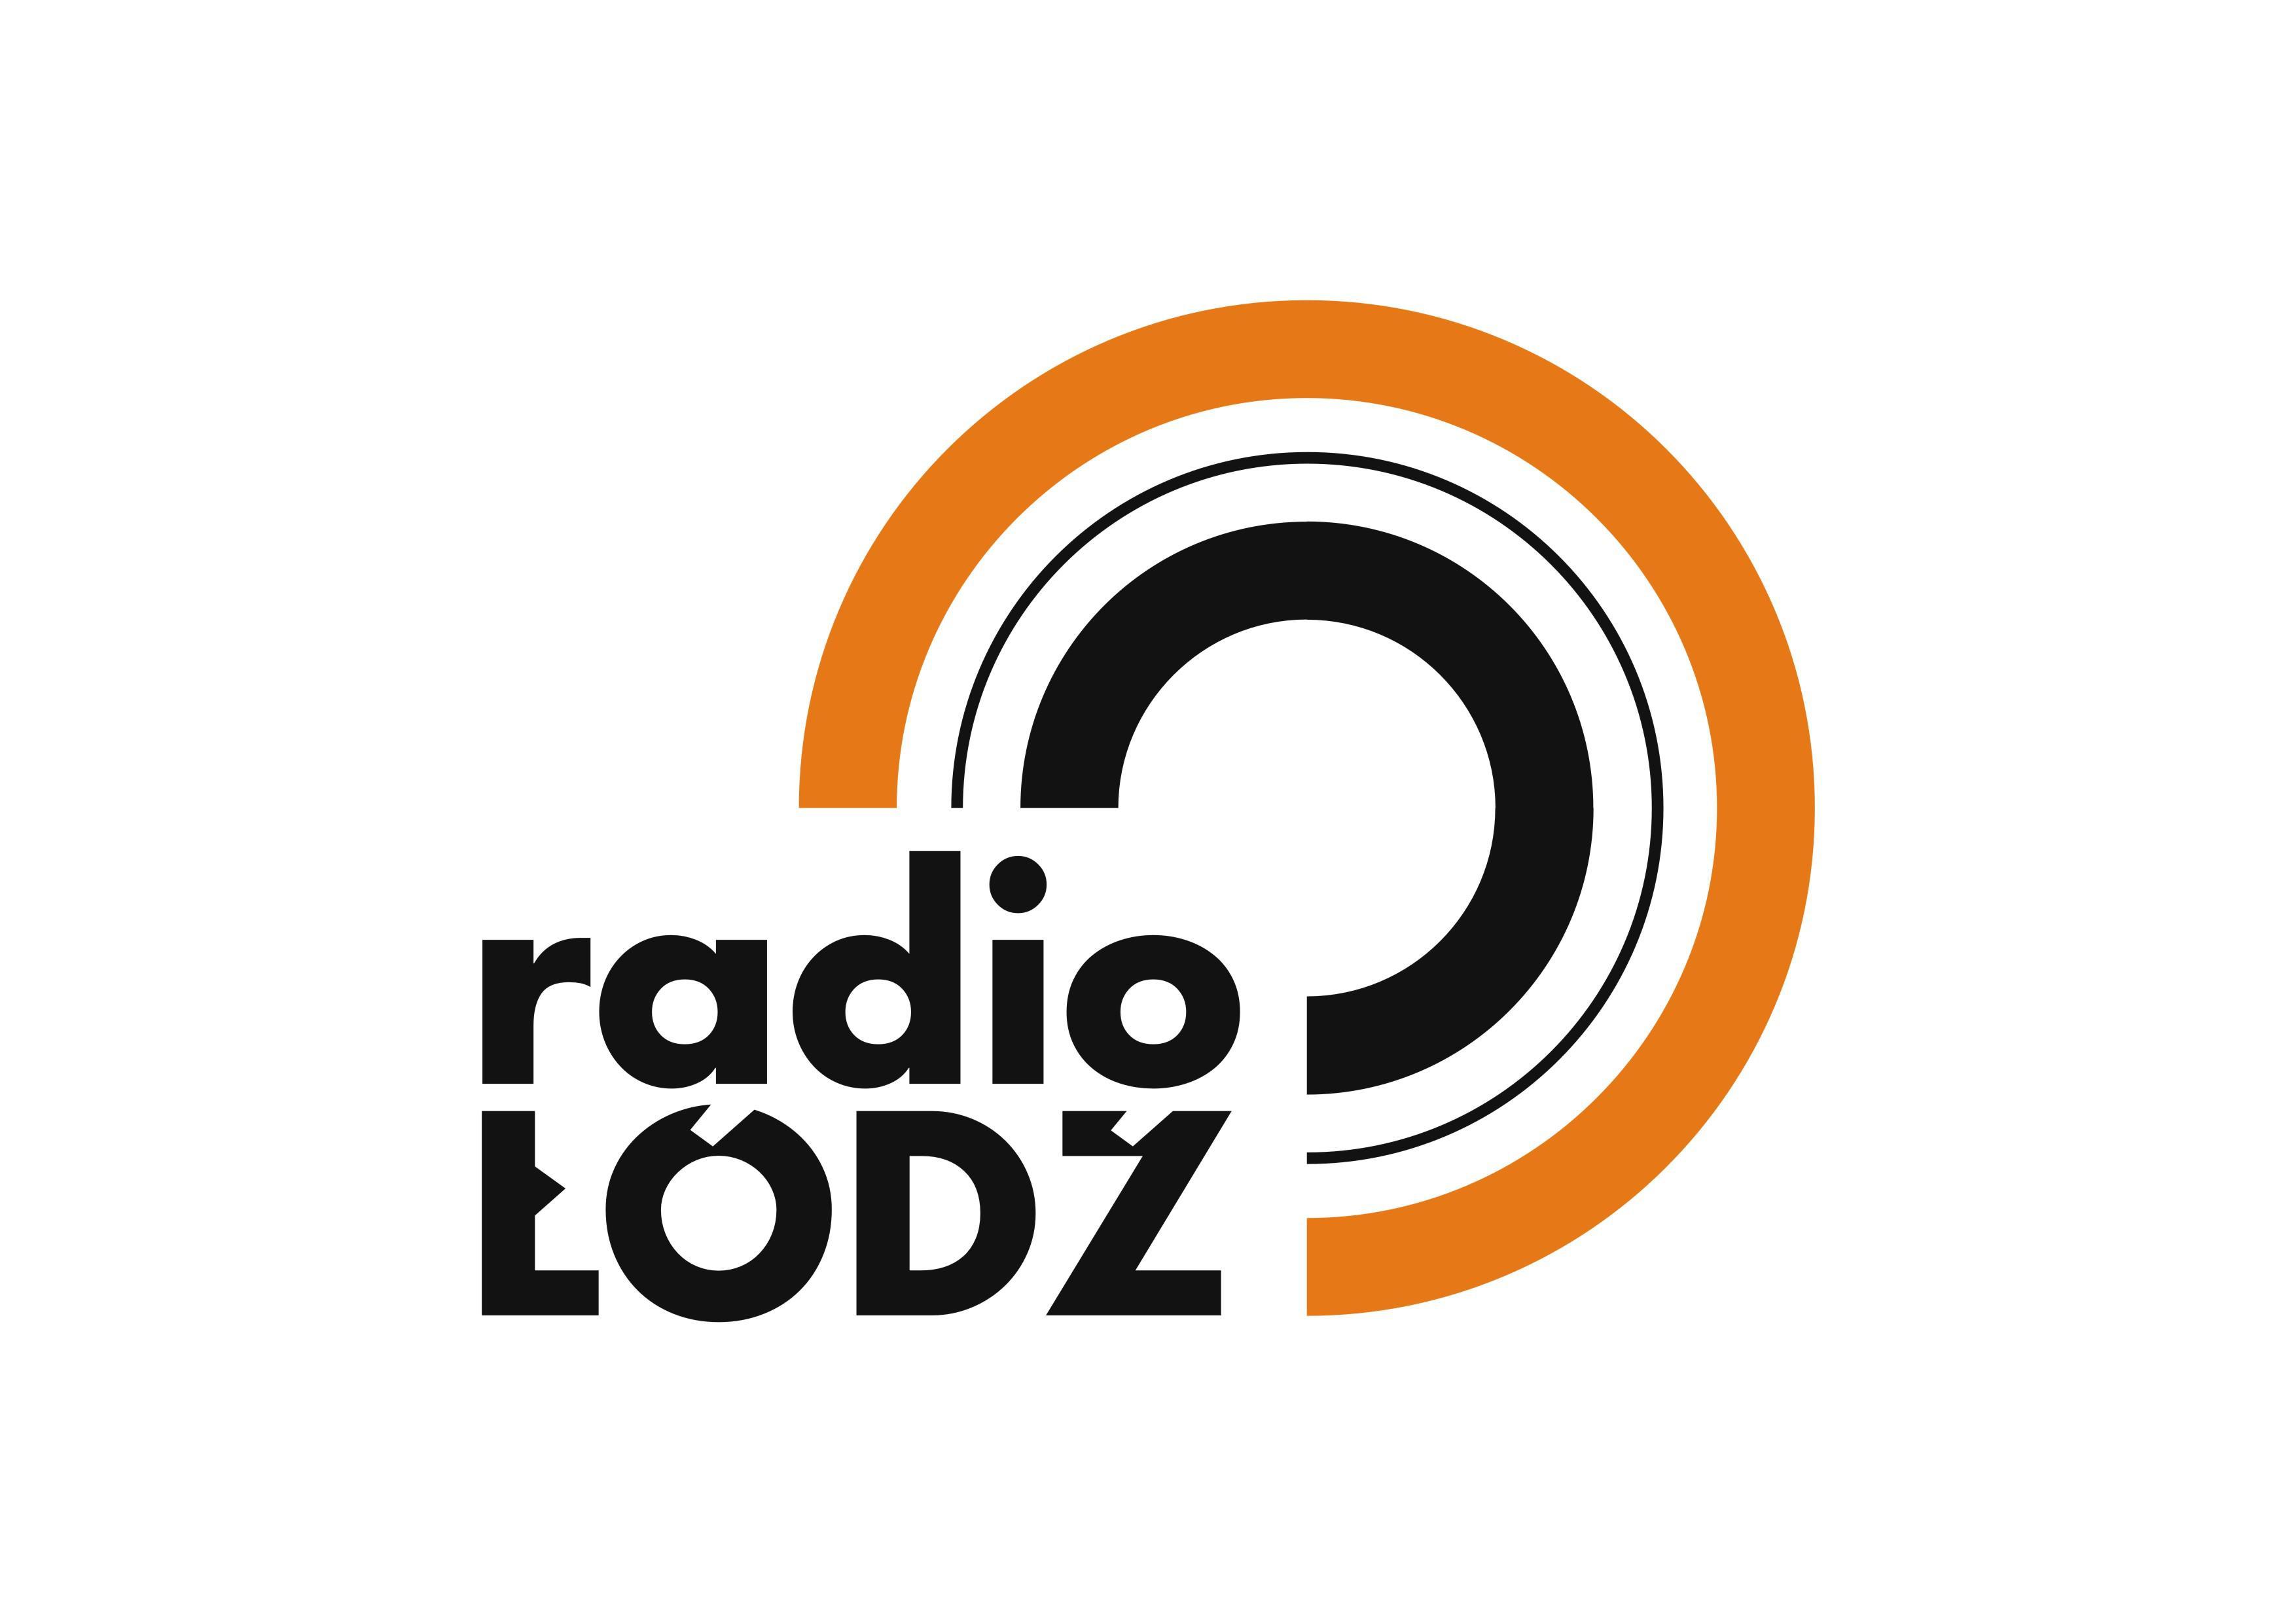 radio lodz